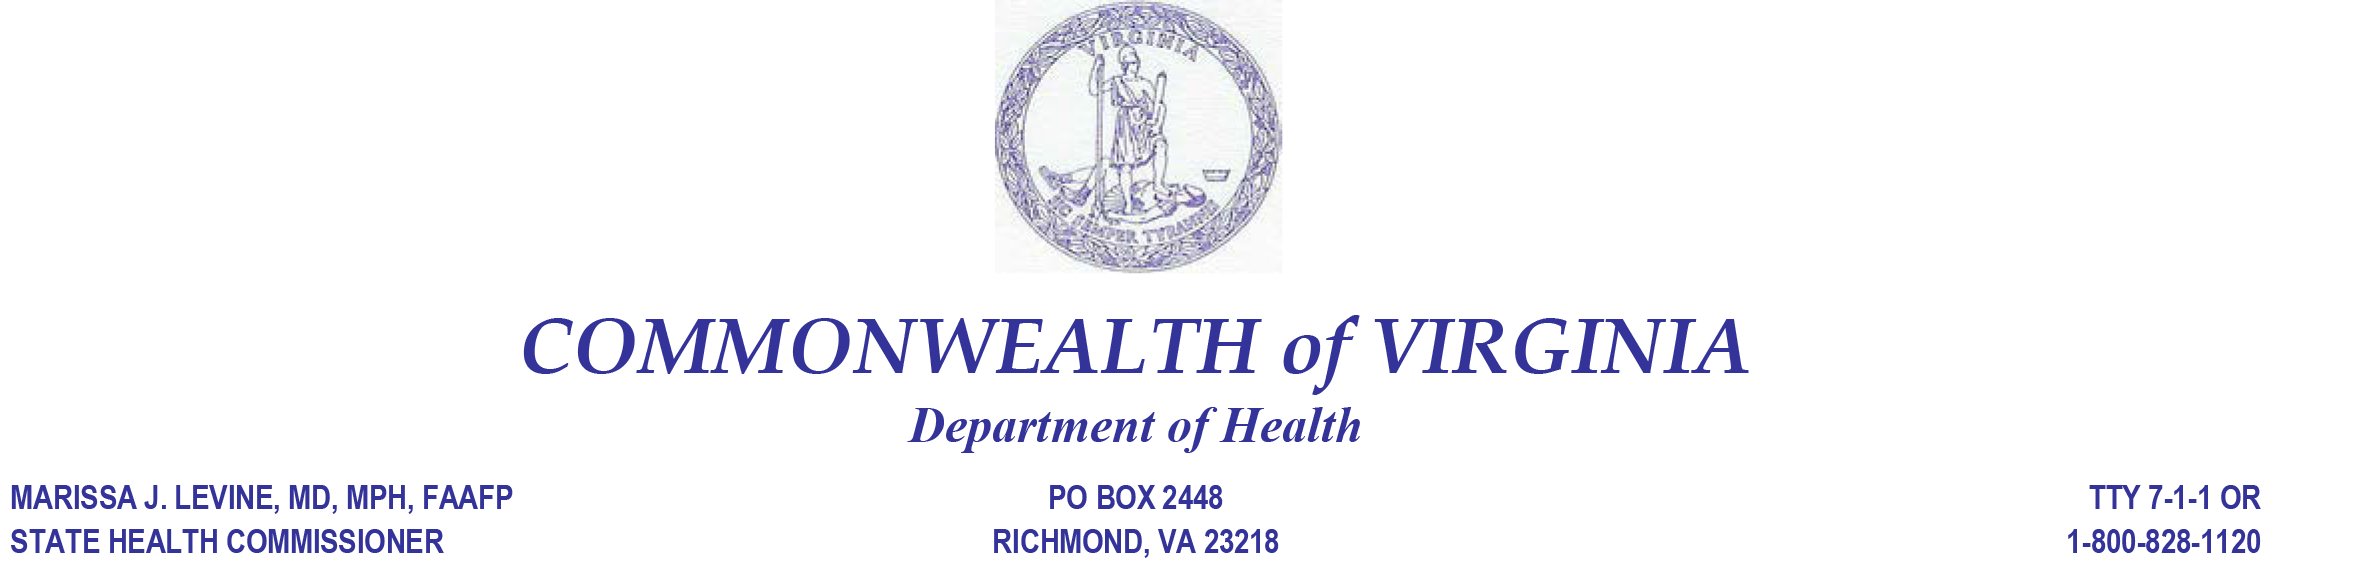 Seal of Virginia. Commonwealth of Virginia. Department of Health. Marissa J. Levine, MD, MPH, FAAFP. State Health Commissioner. PO BOX 2448 Richmond VA, 23218, TTY 9-1-1 or 1-800-828-1120.